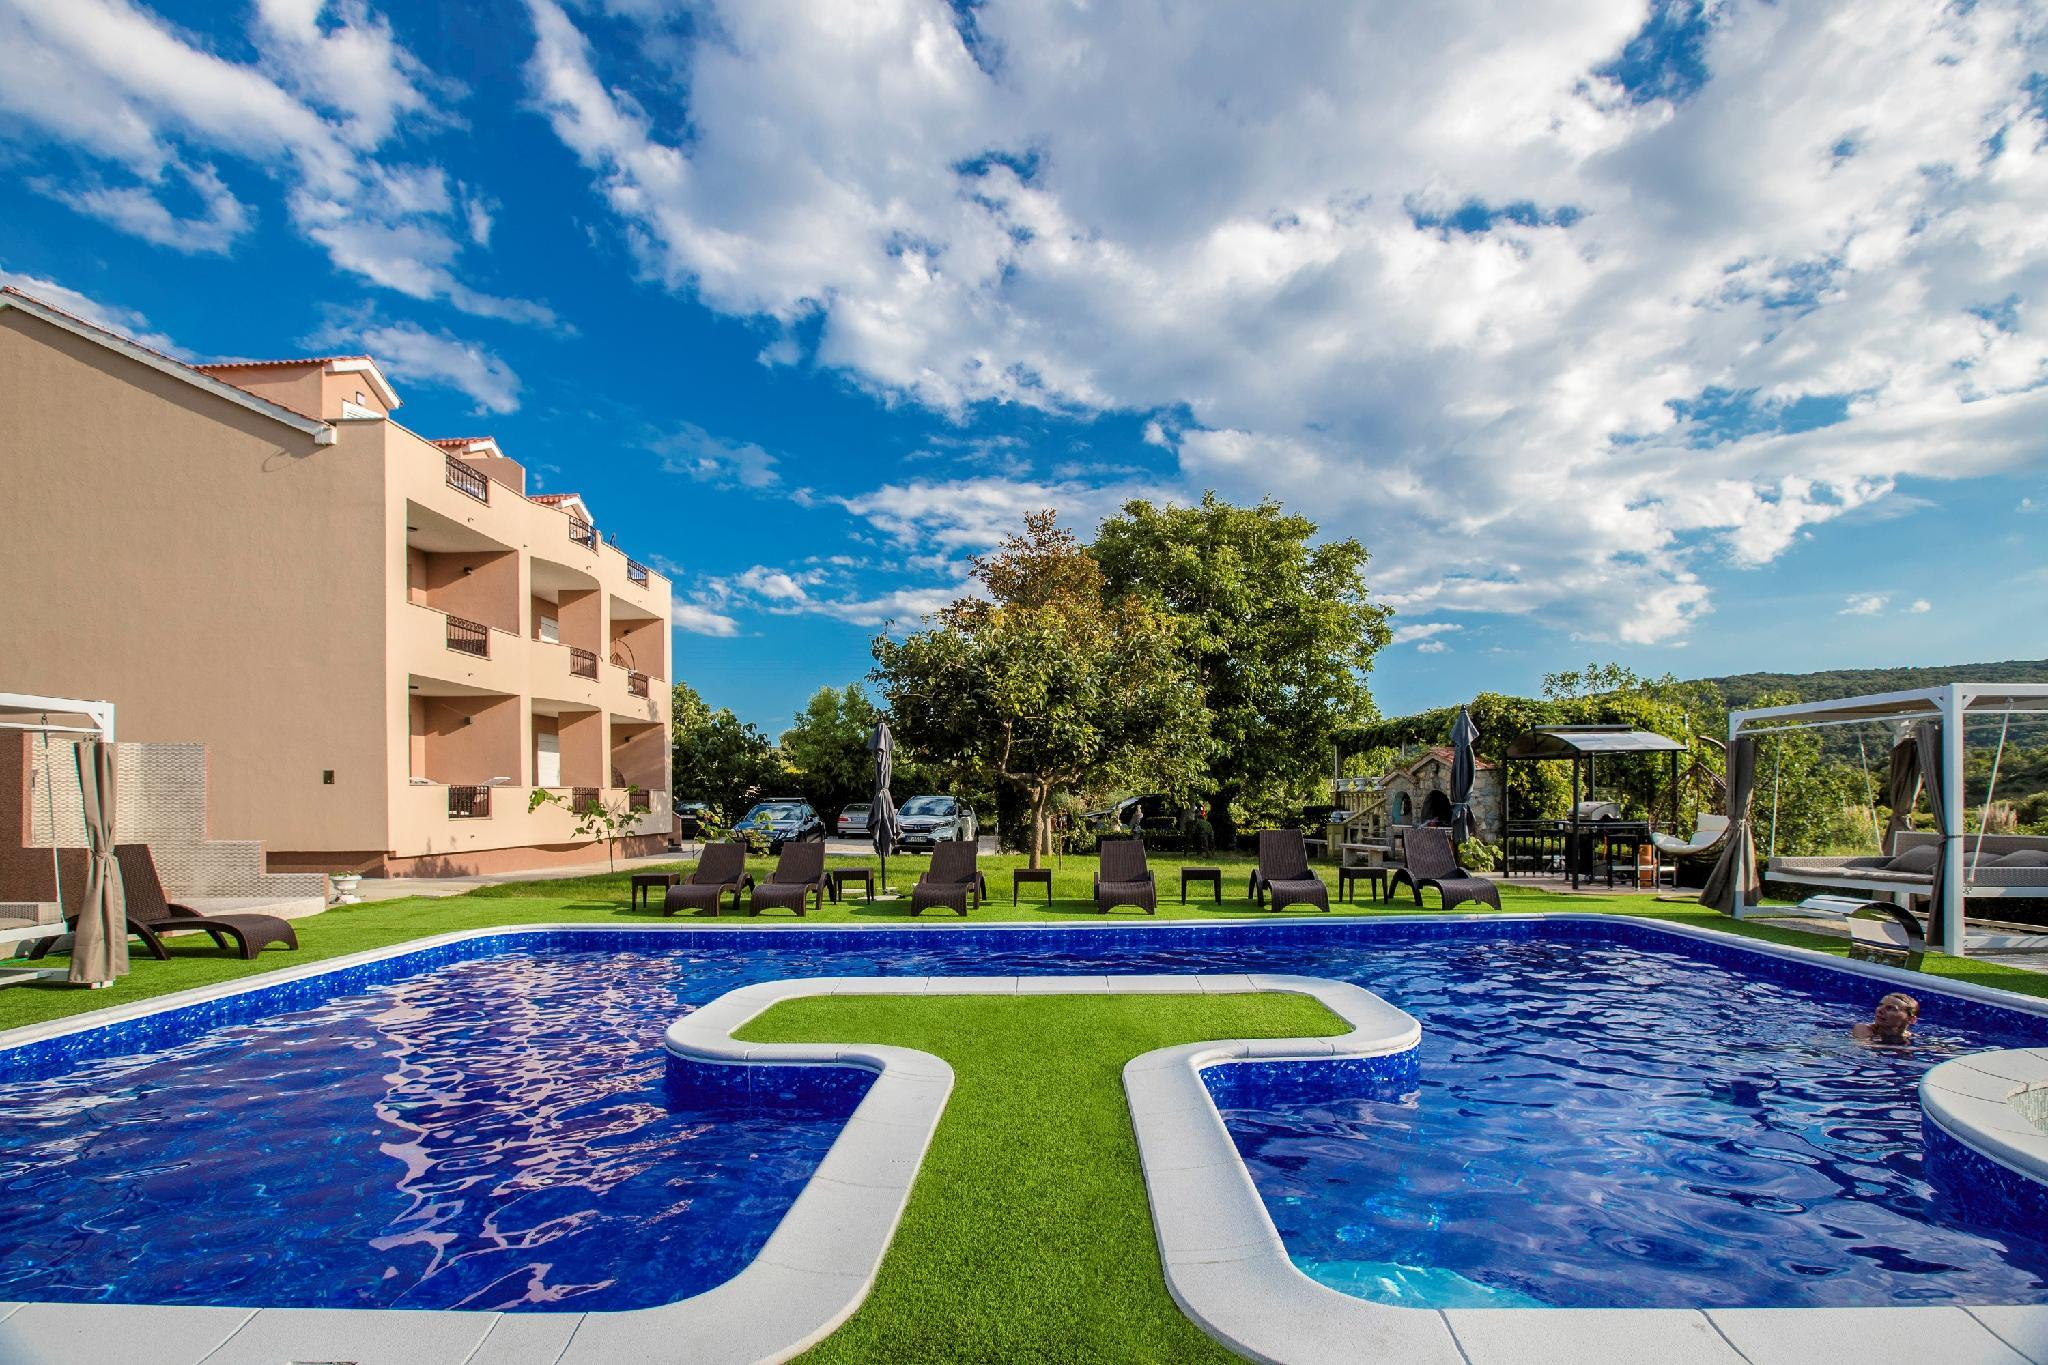 Villa Subic   Luxury Apartments On Island Rab